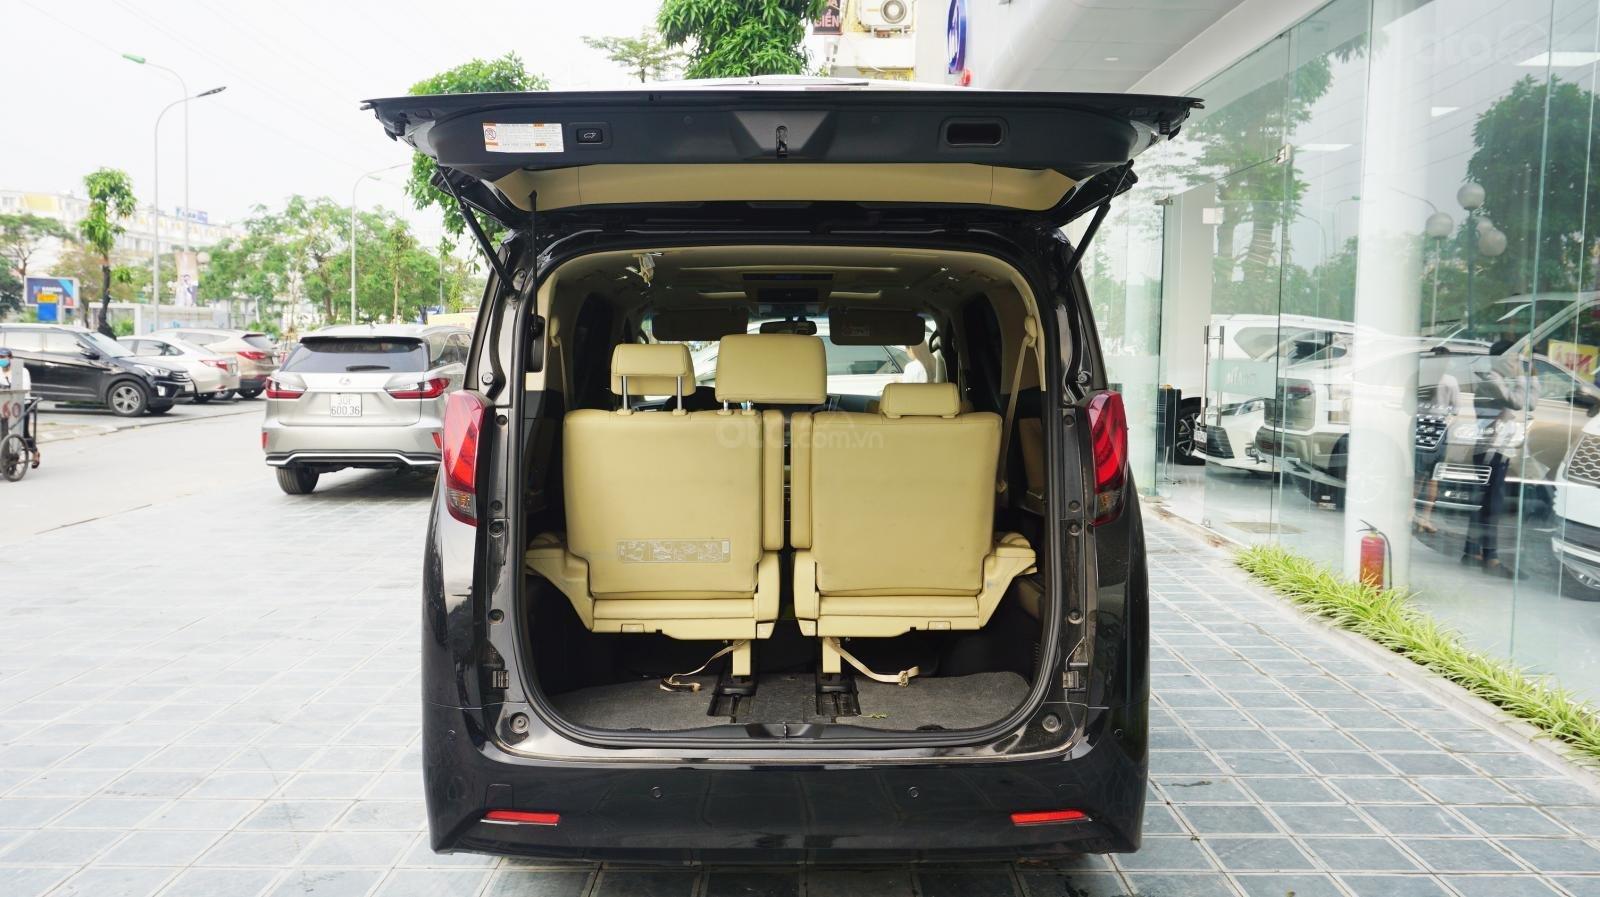 Bán Toyota Alphard 3.5L - V6 sản xuất 2017 model 2018, Mr Huân 0981.0101.61 (20)